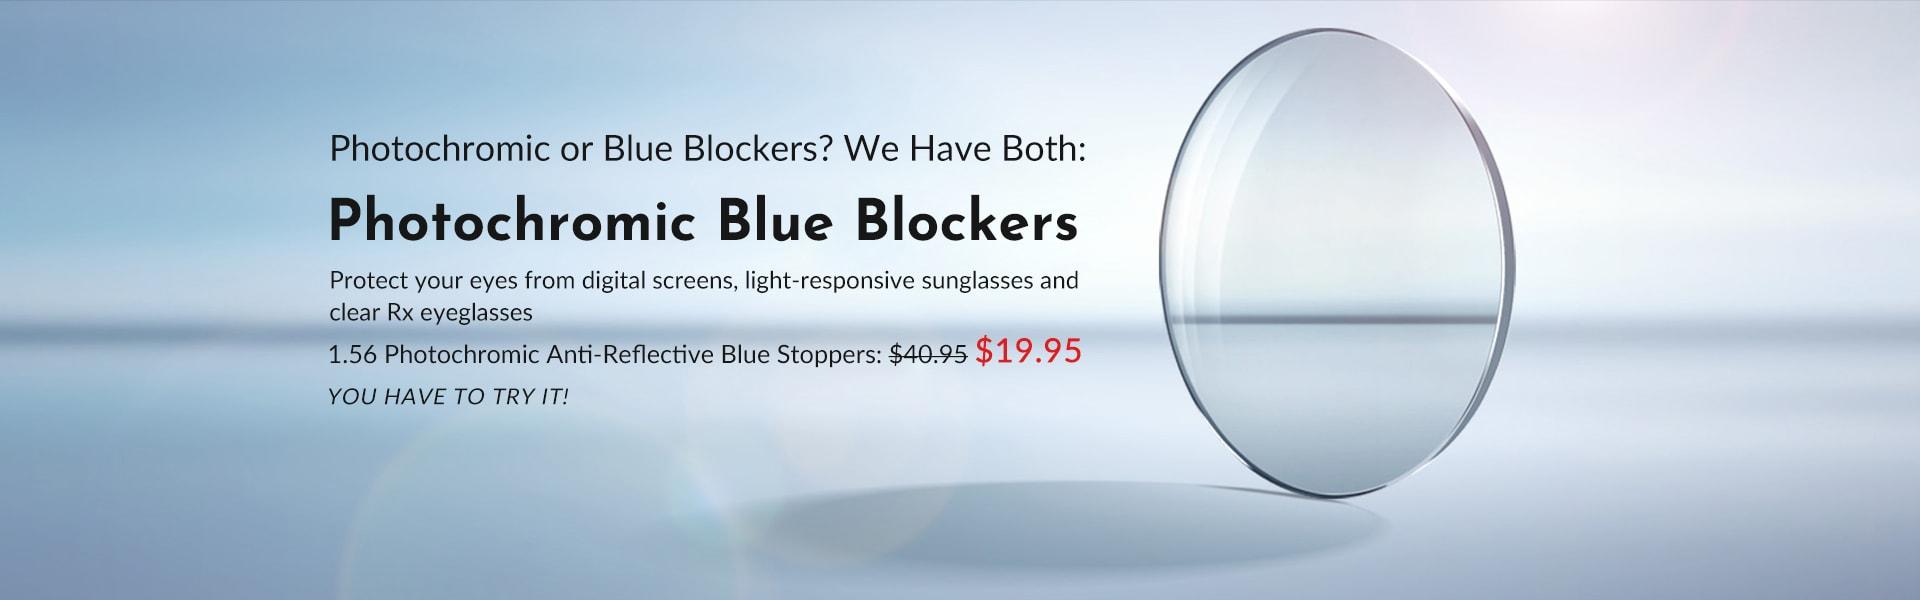 blue blocker